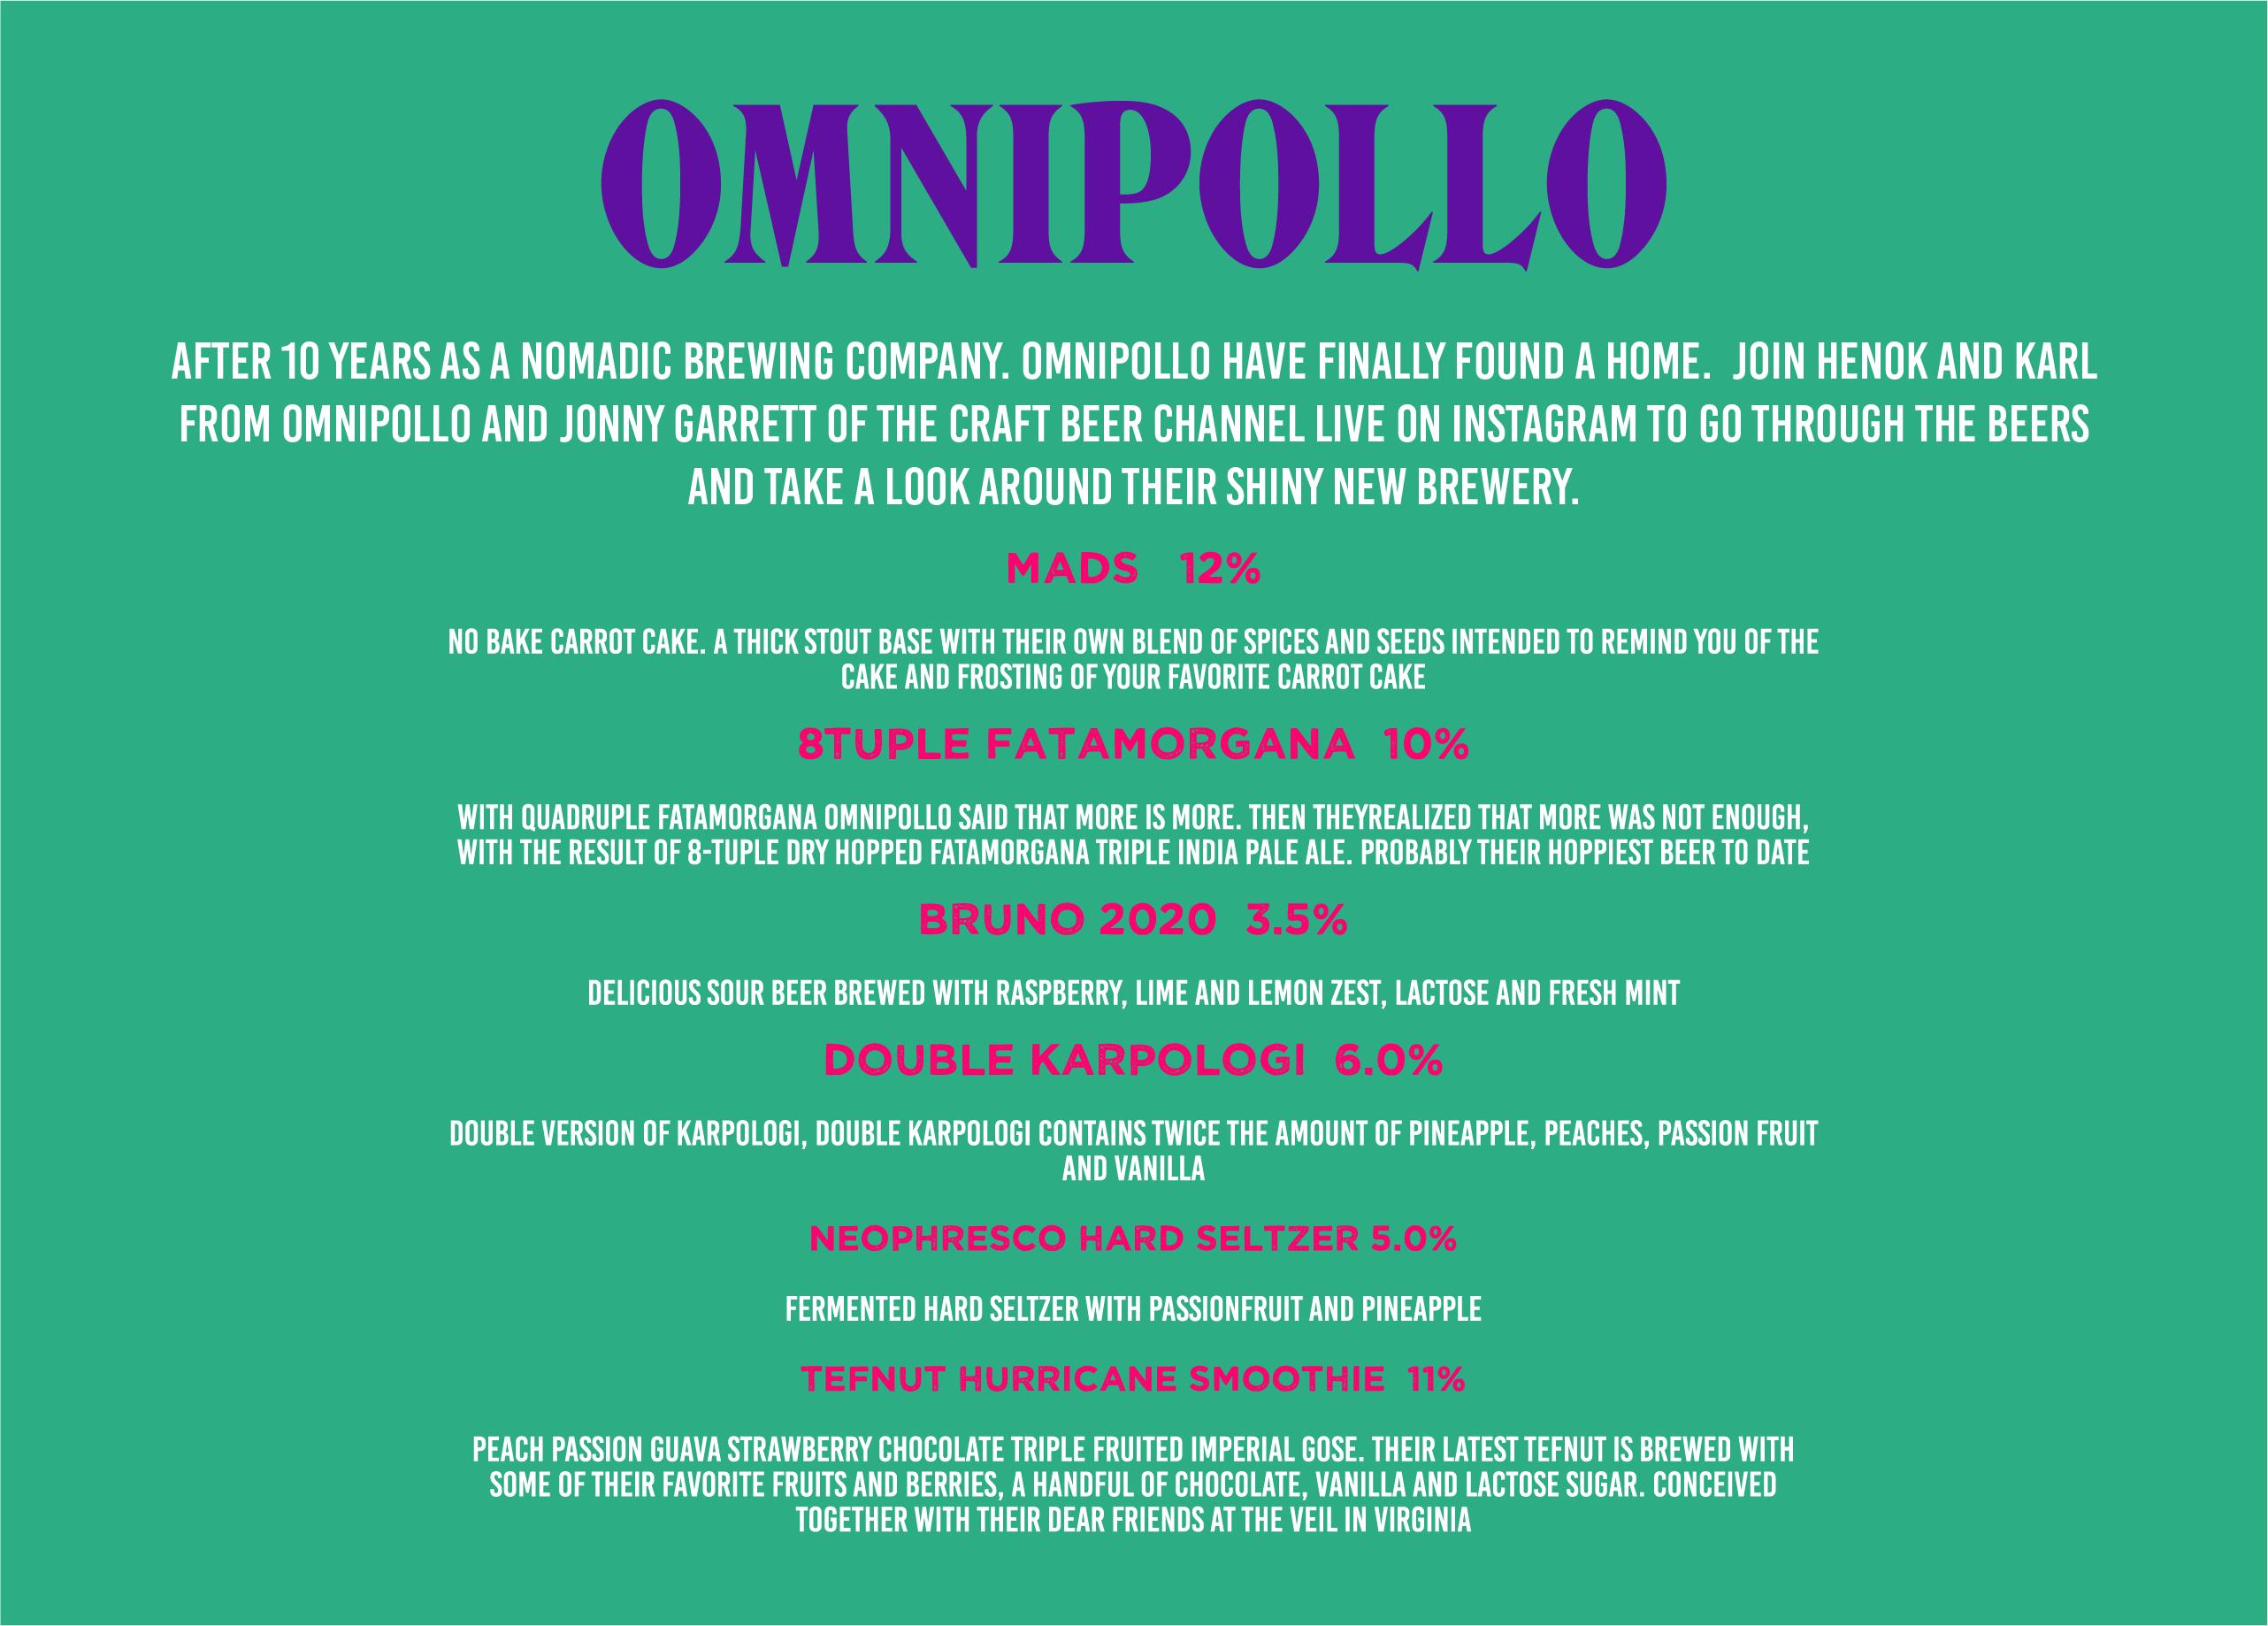 OMNIPOLLO MIXED BOX SAVER